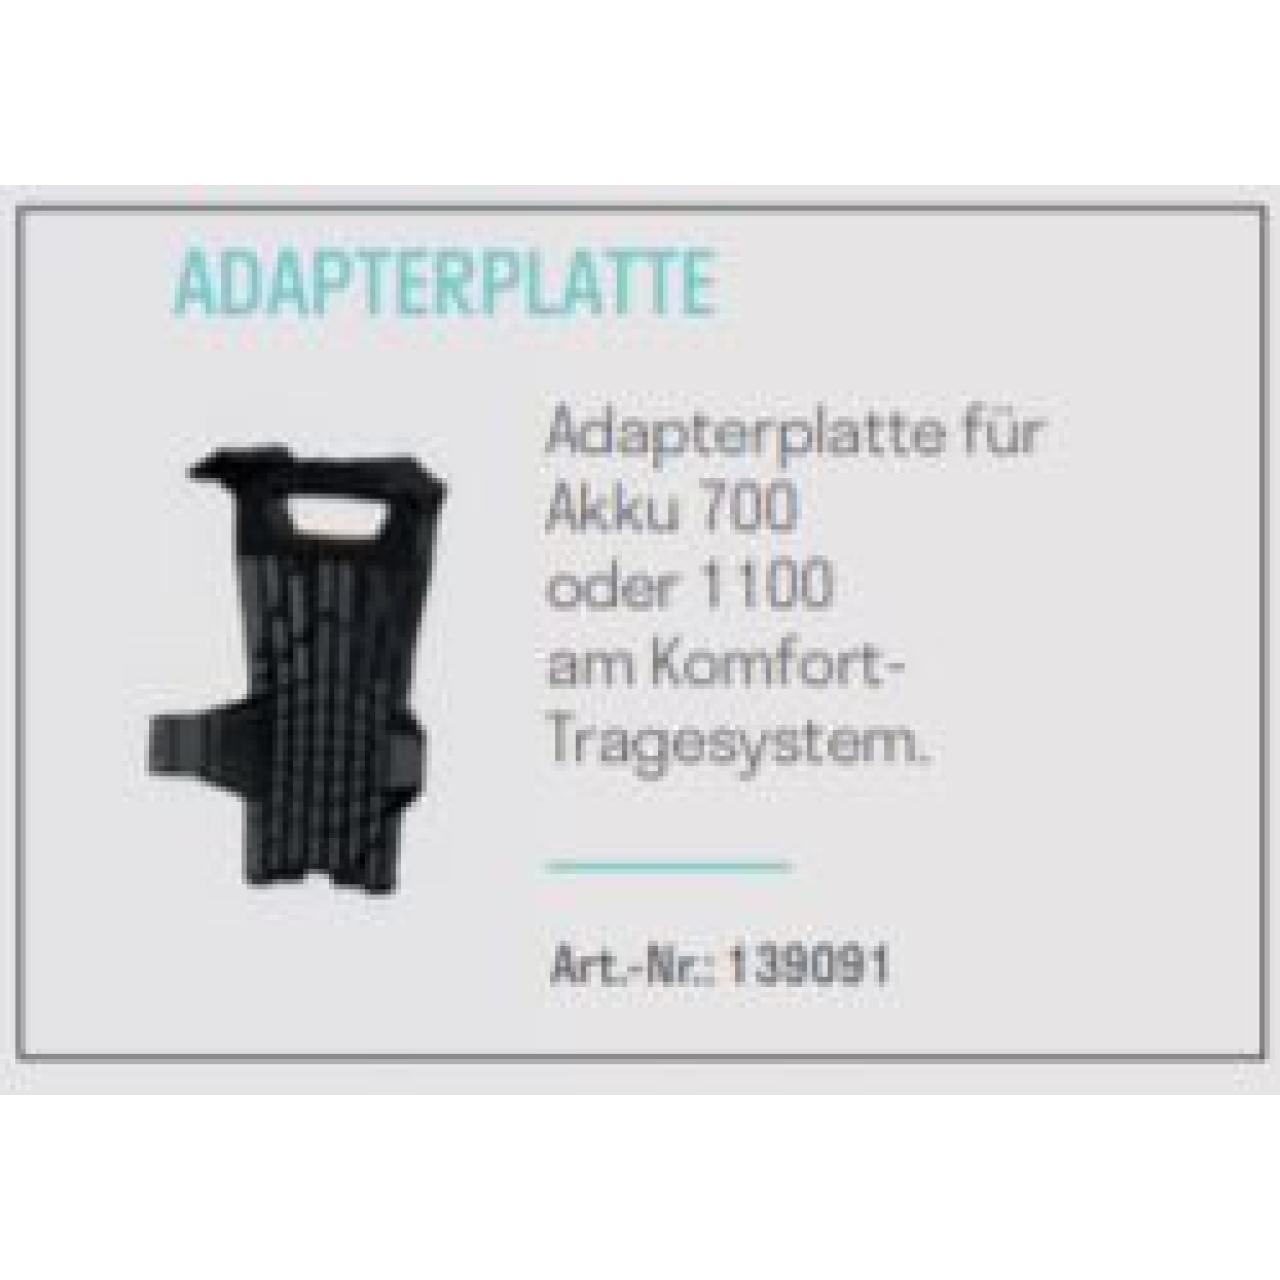 Adapterplatte ULiB 700/1100 für Komfort-Tragesystem ULiB 1200/1500